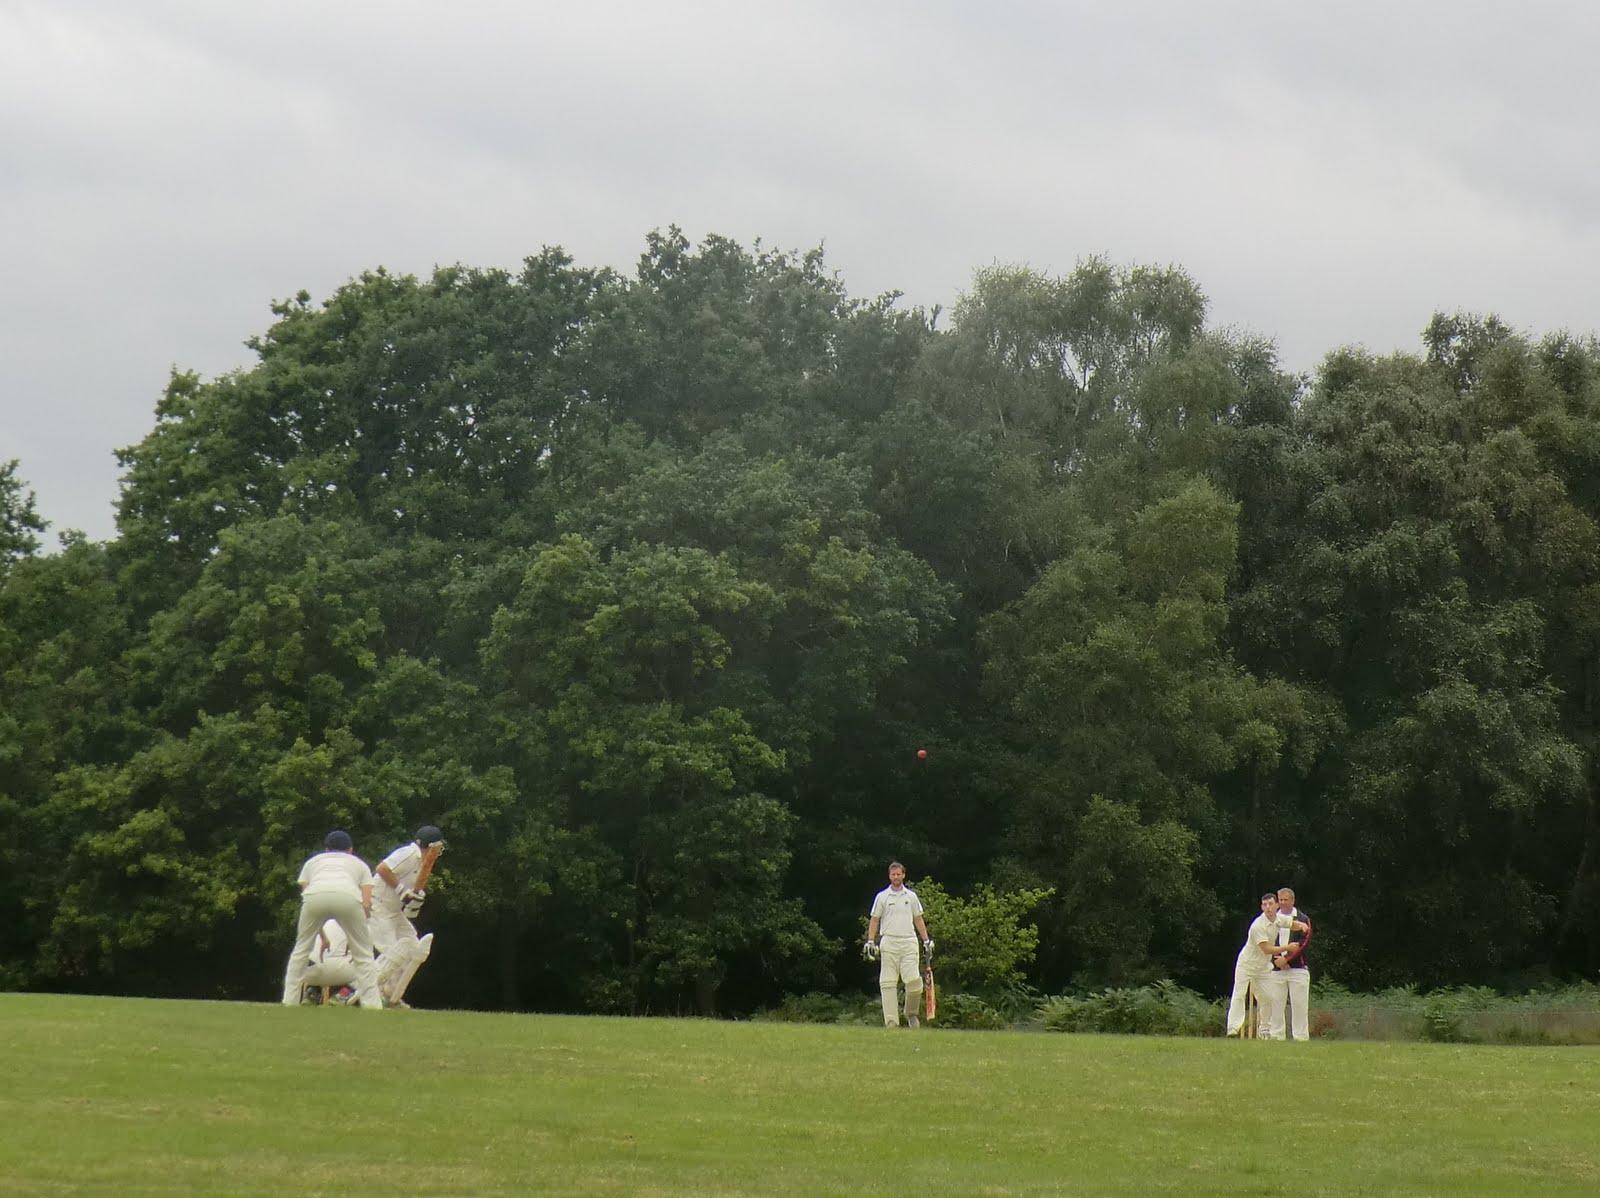 CIMG5928 Cricket at Coleman's Hatch